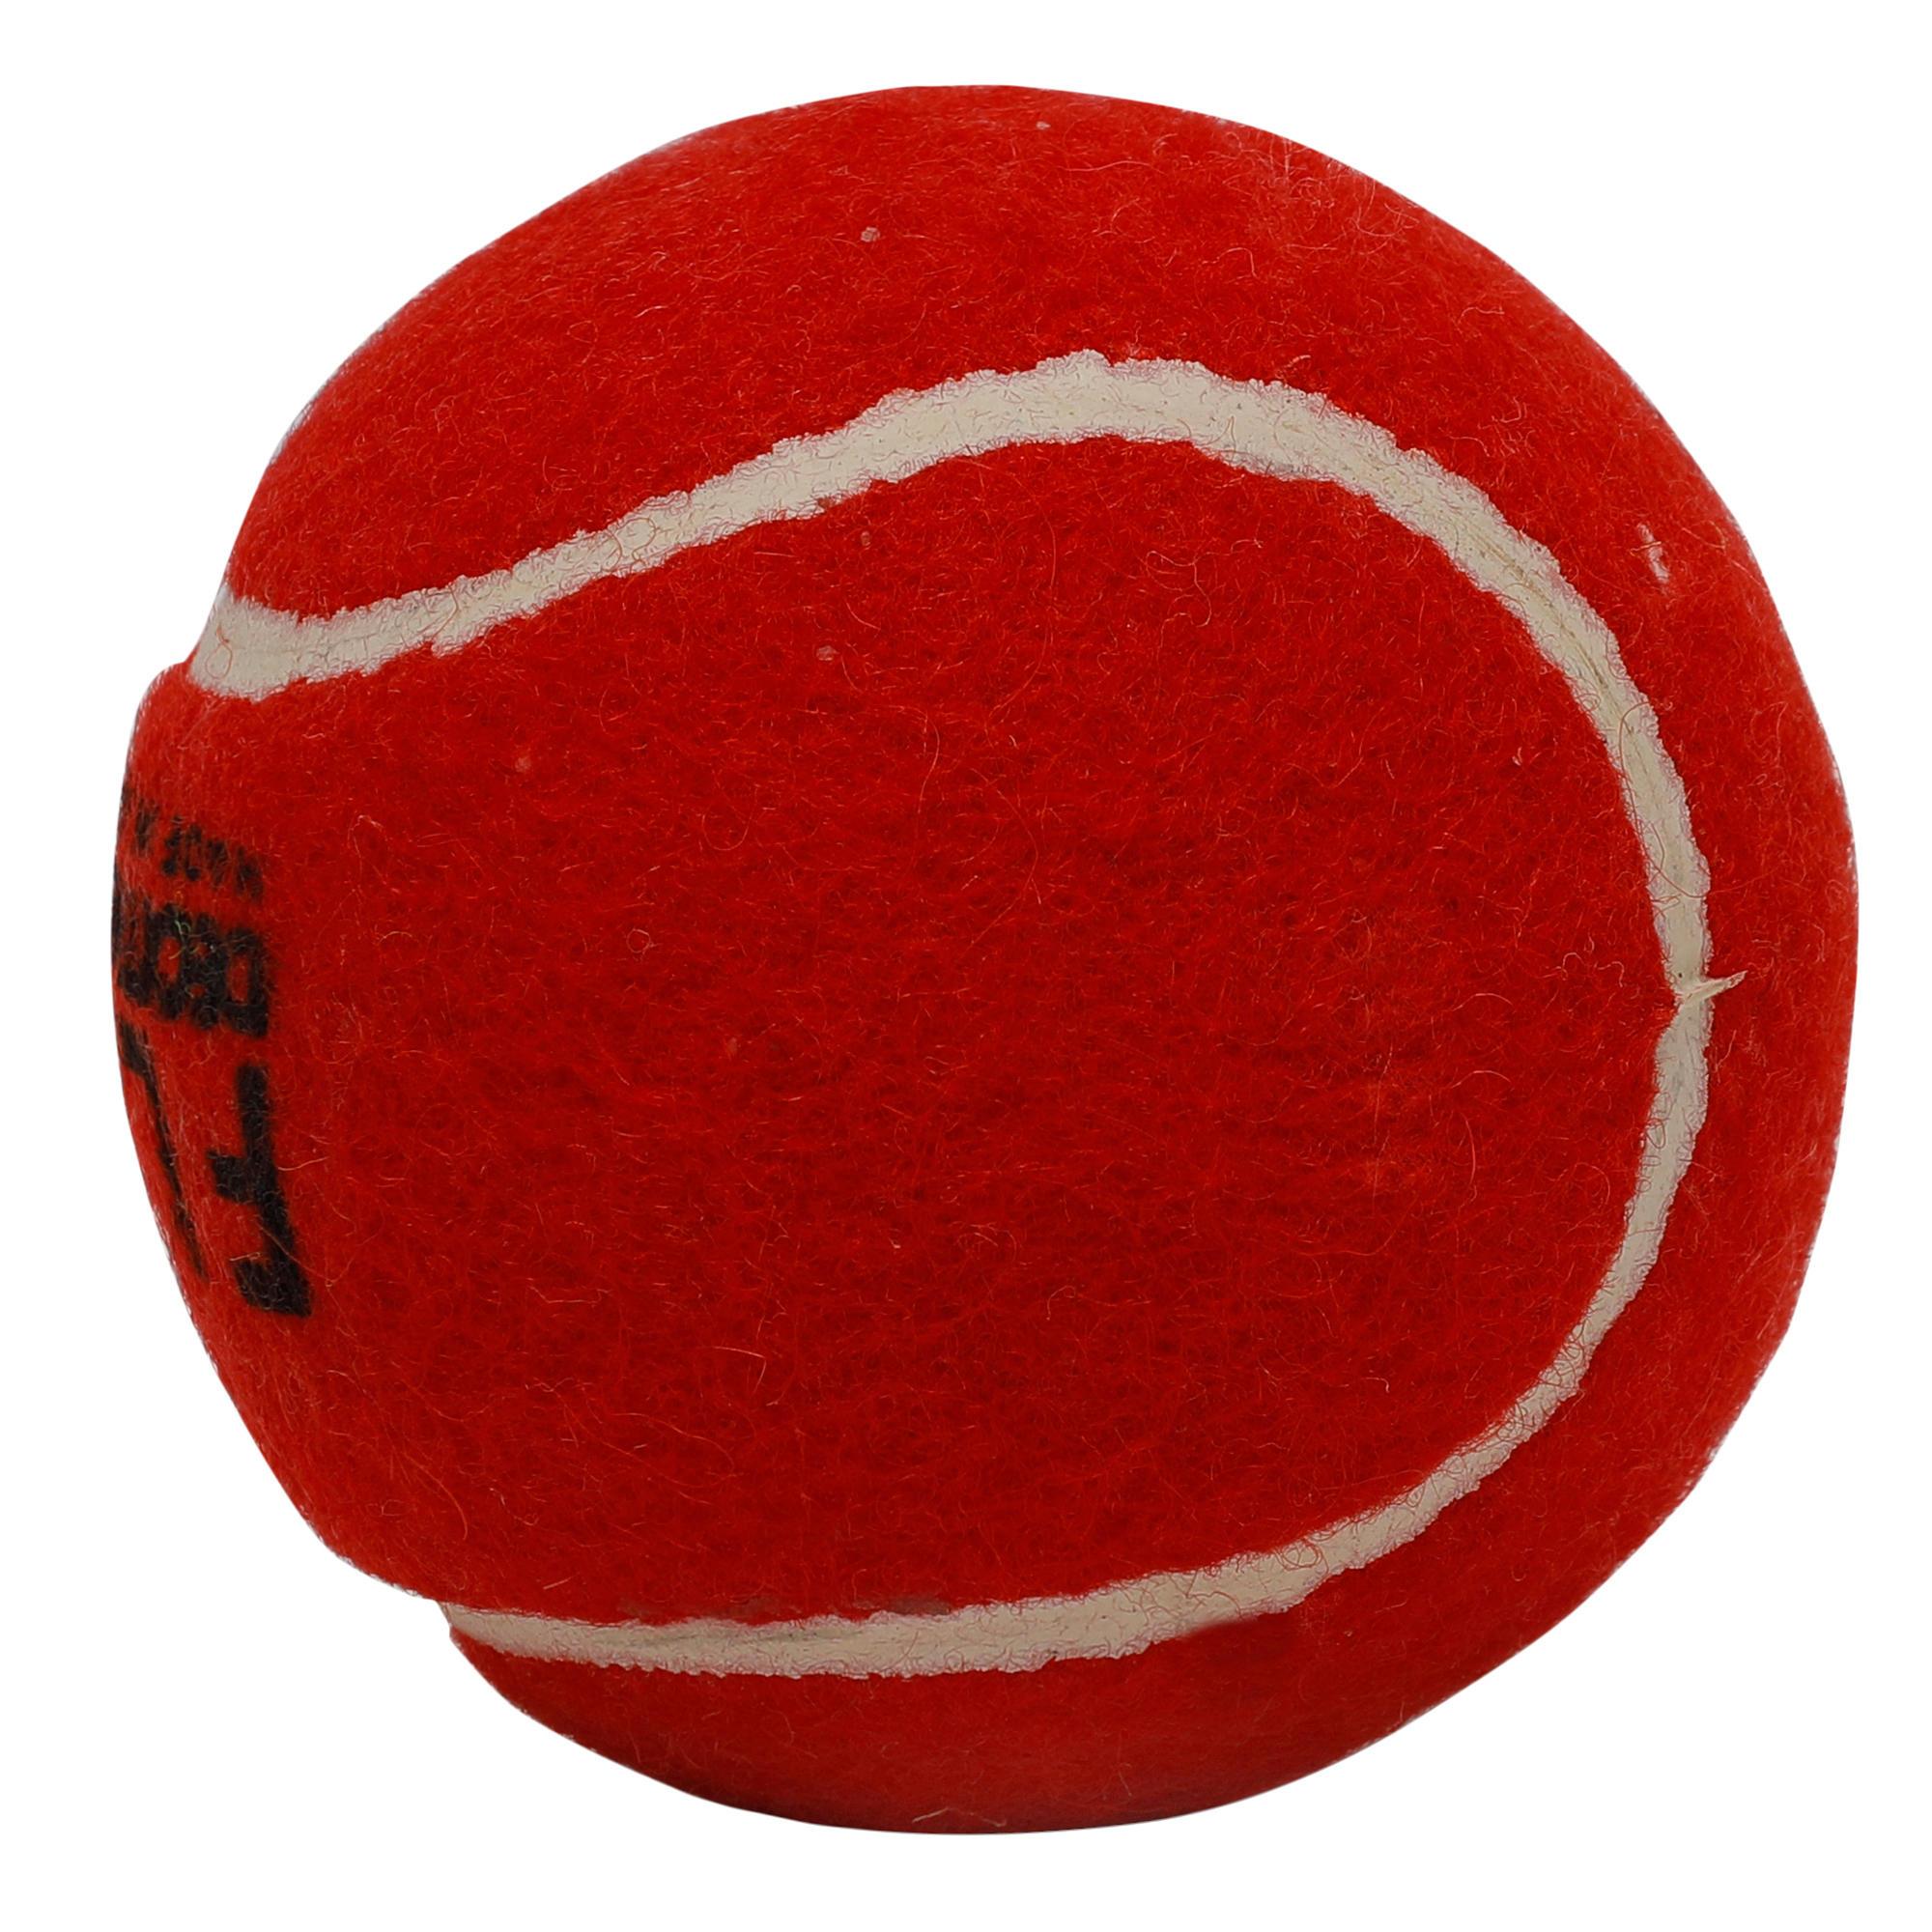 Cricket Meduim Hard Tennis ball, for cricket, red